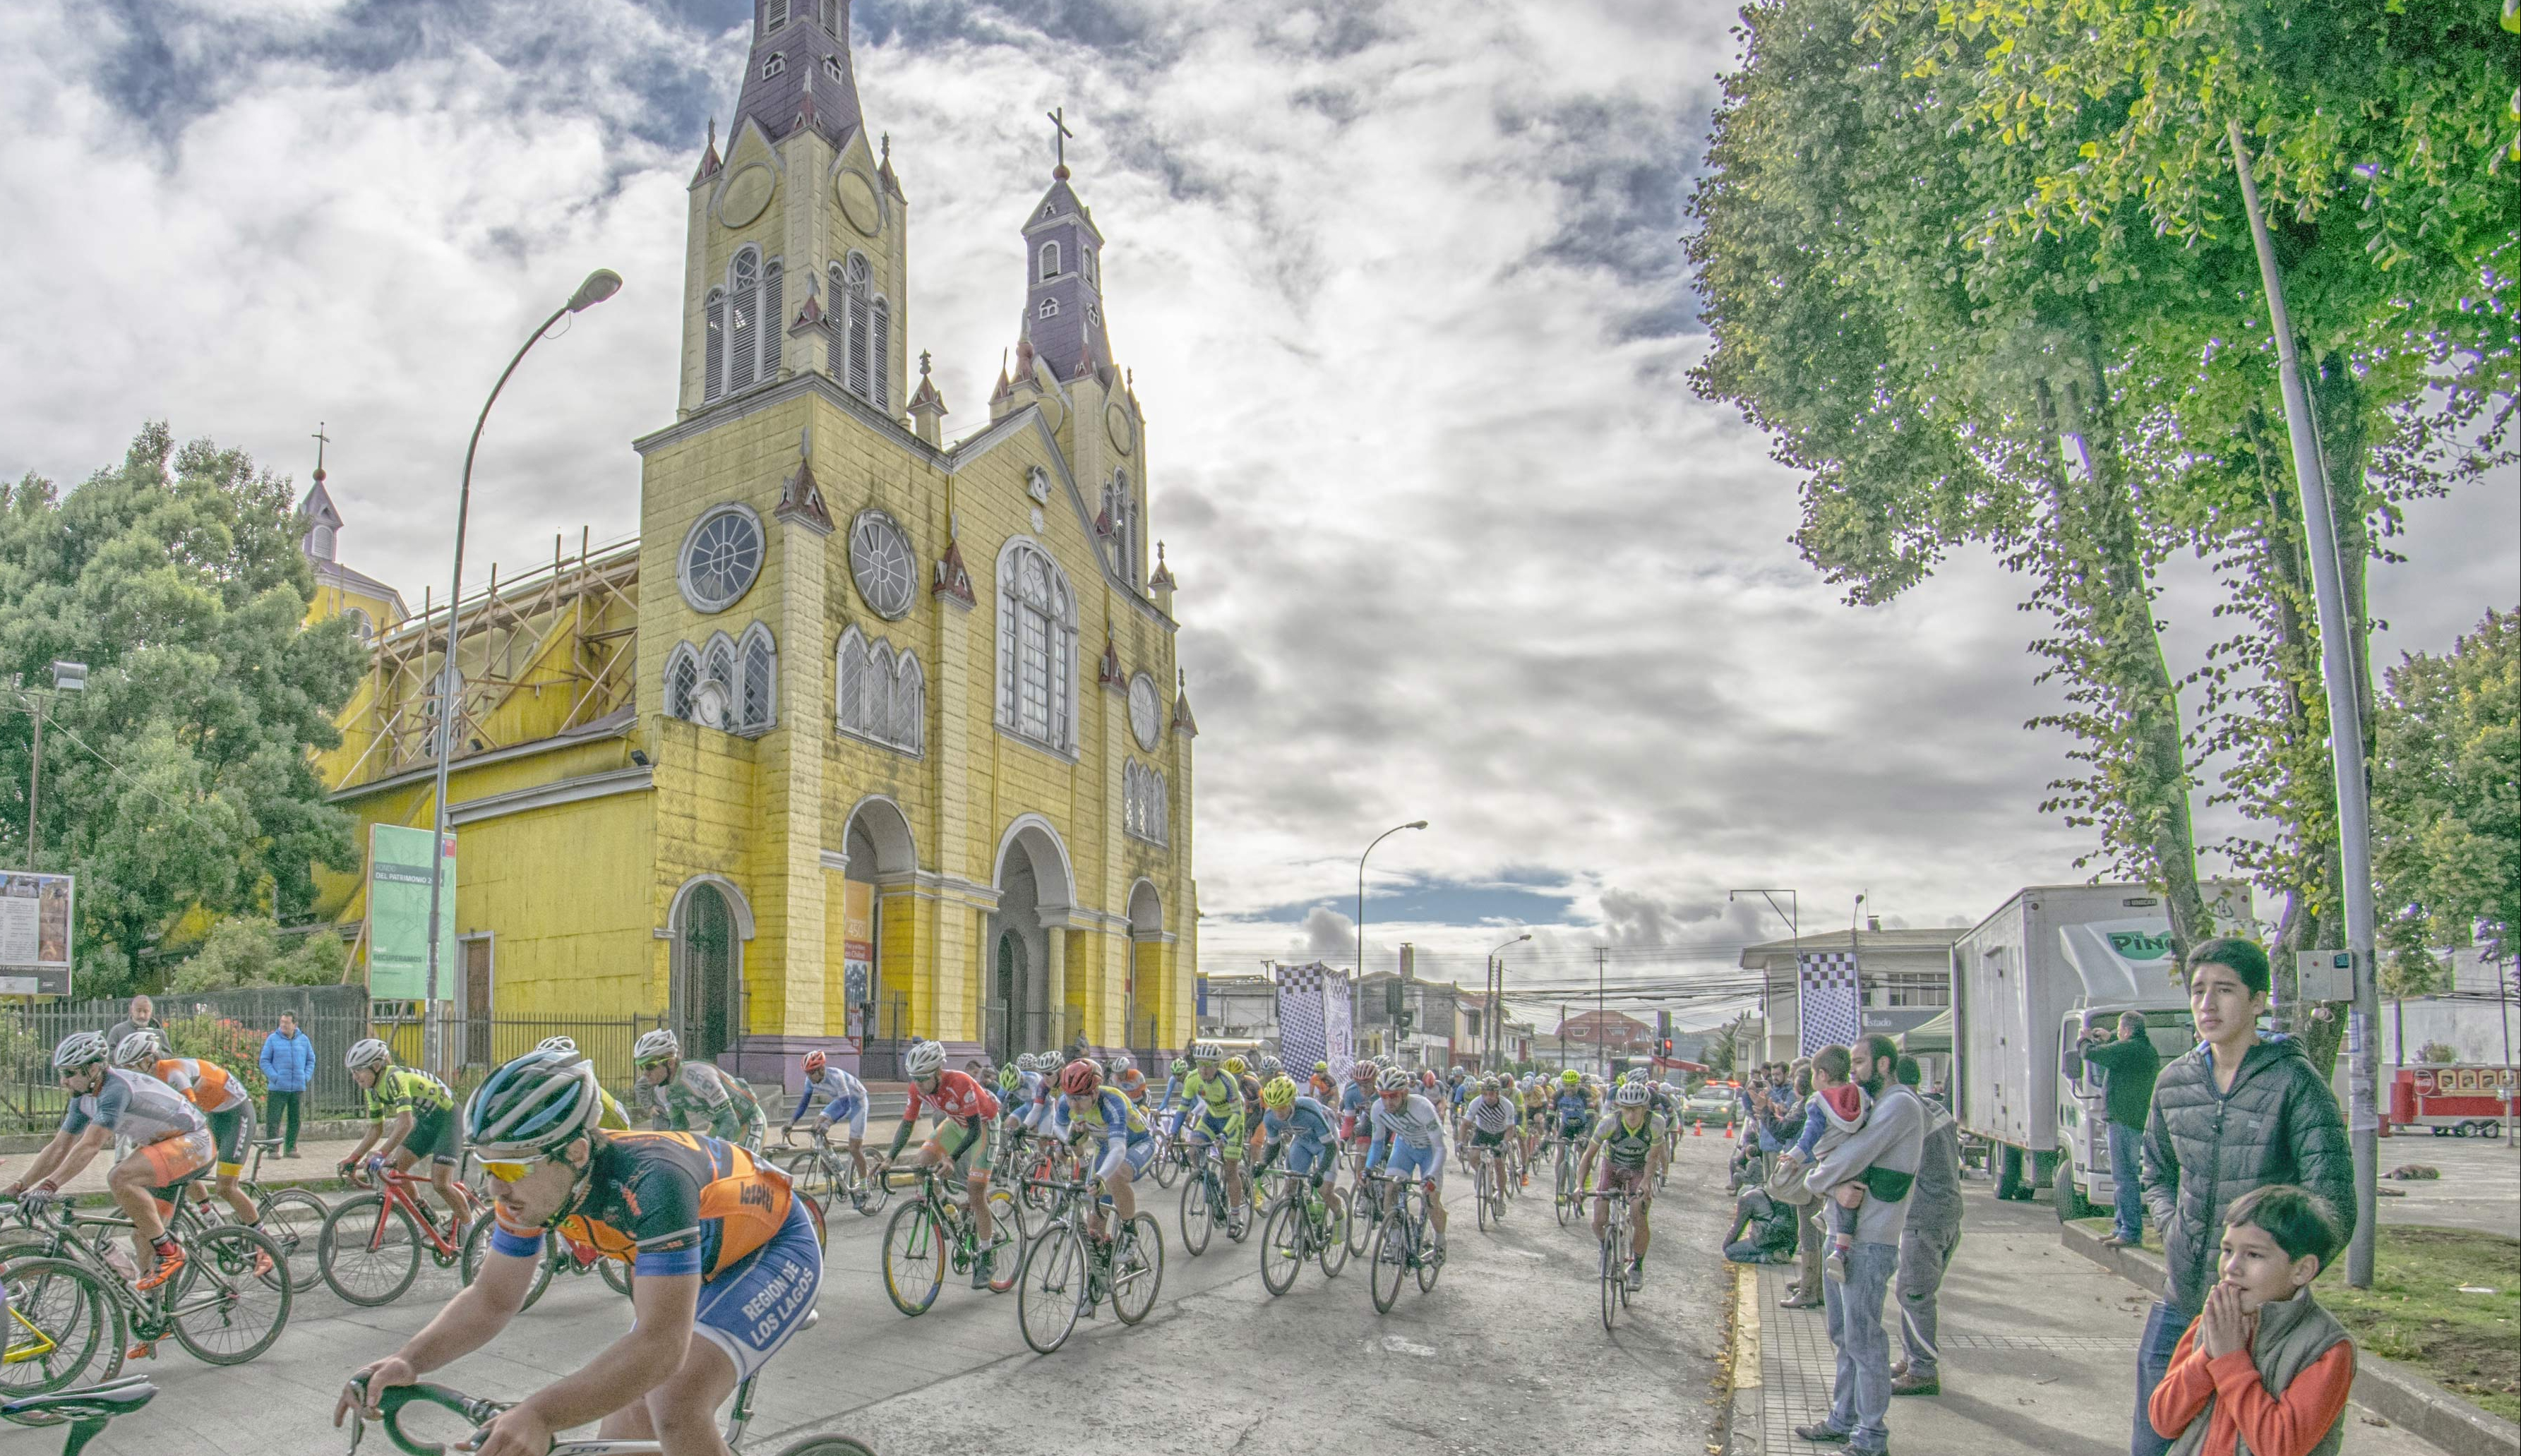 Vuelta ciclista a chiloÉ 2018 photo